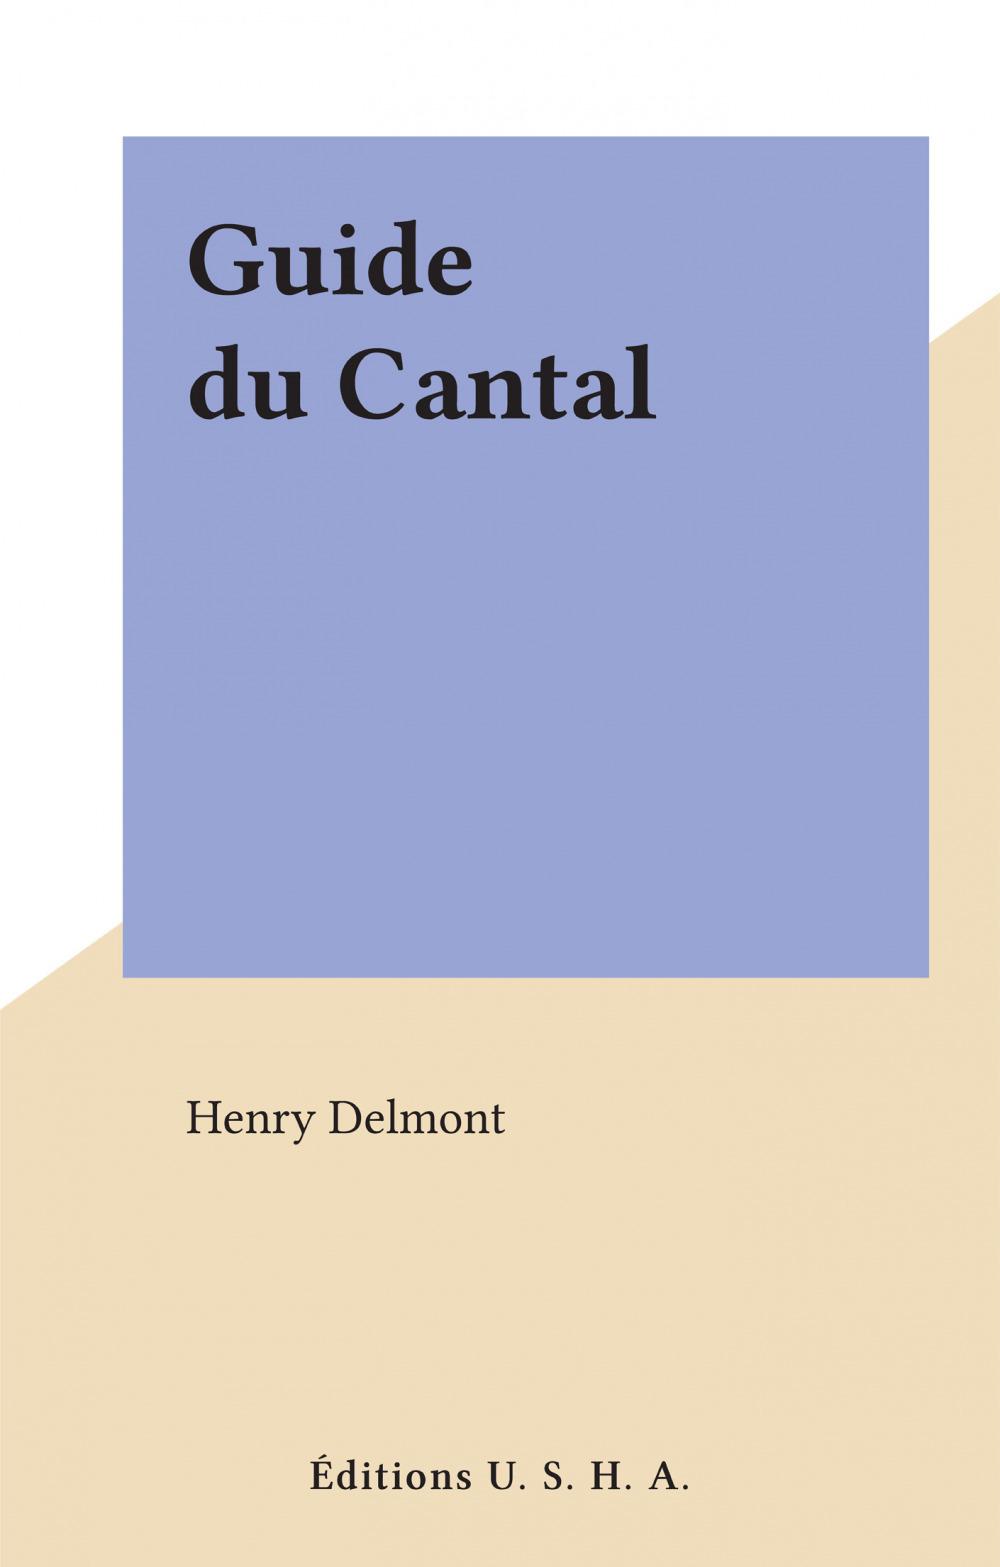 Guide du Cantal